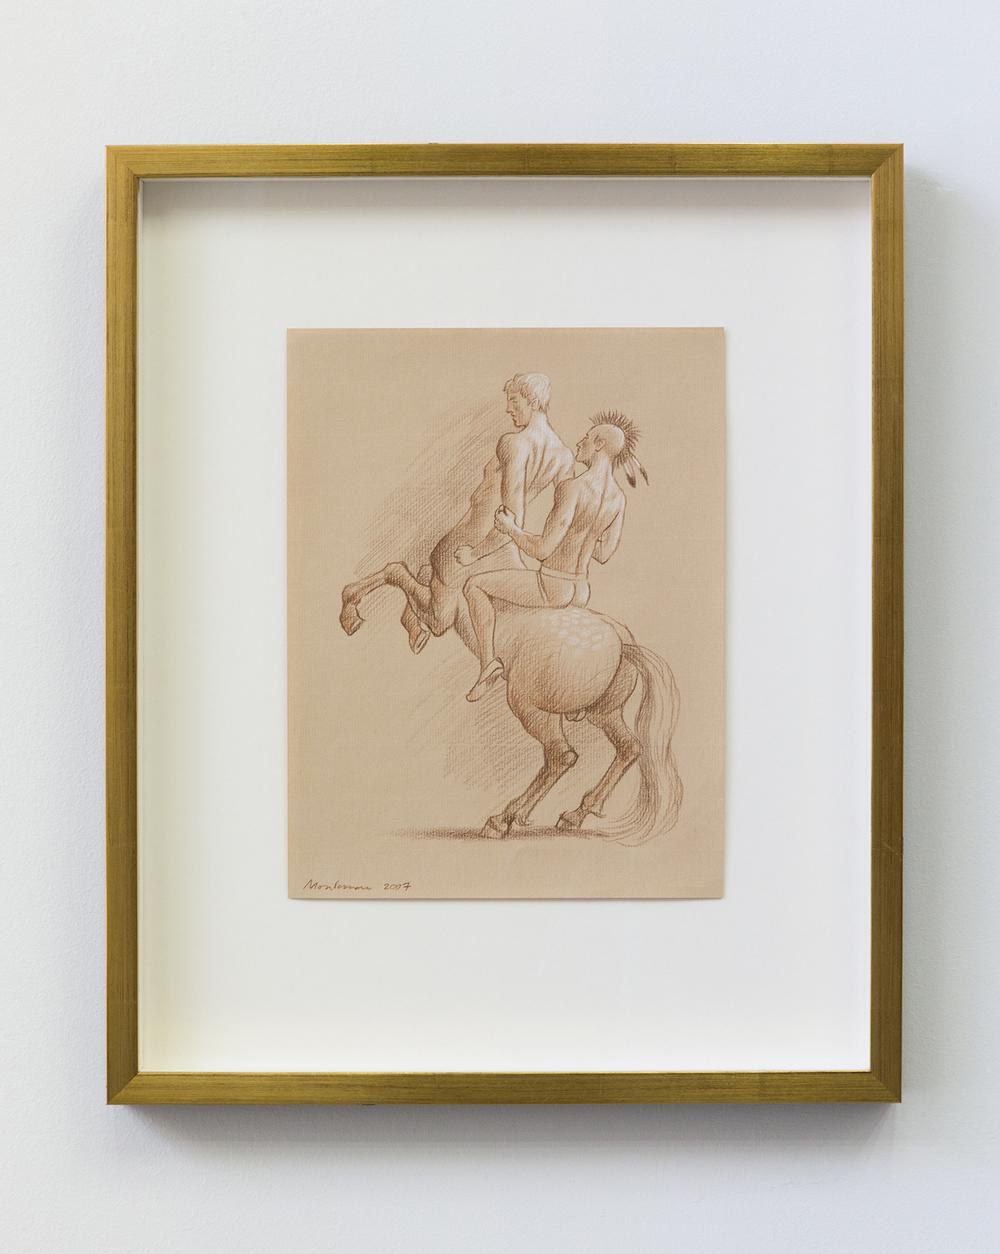 Study for the Triumph of Mischief (Centaur)